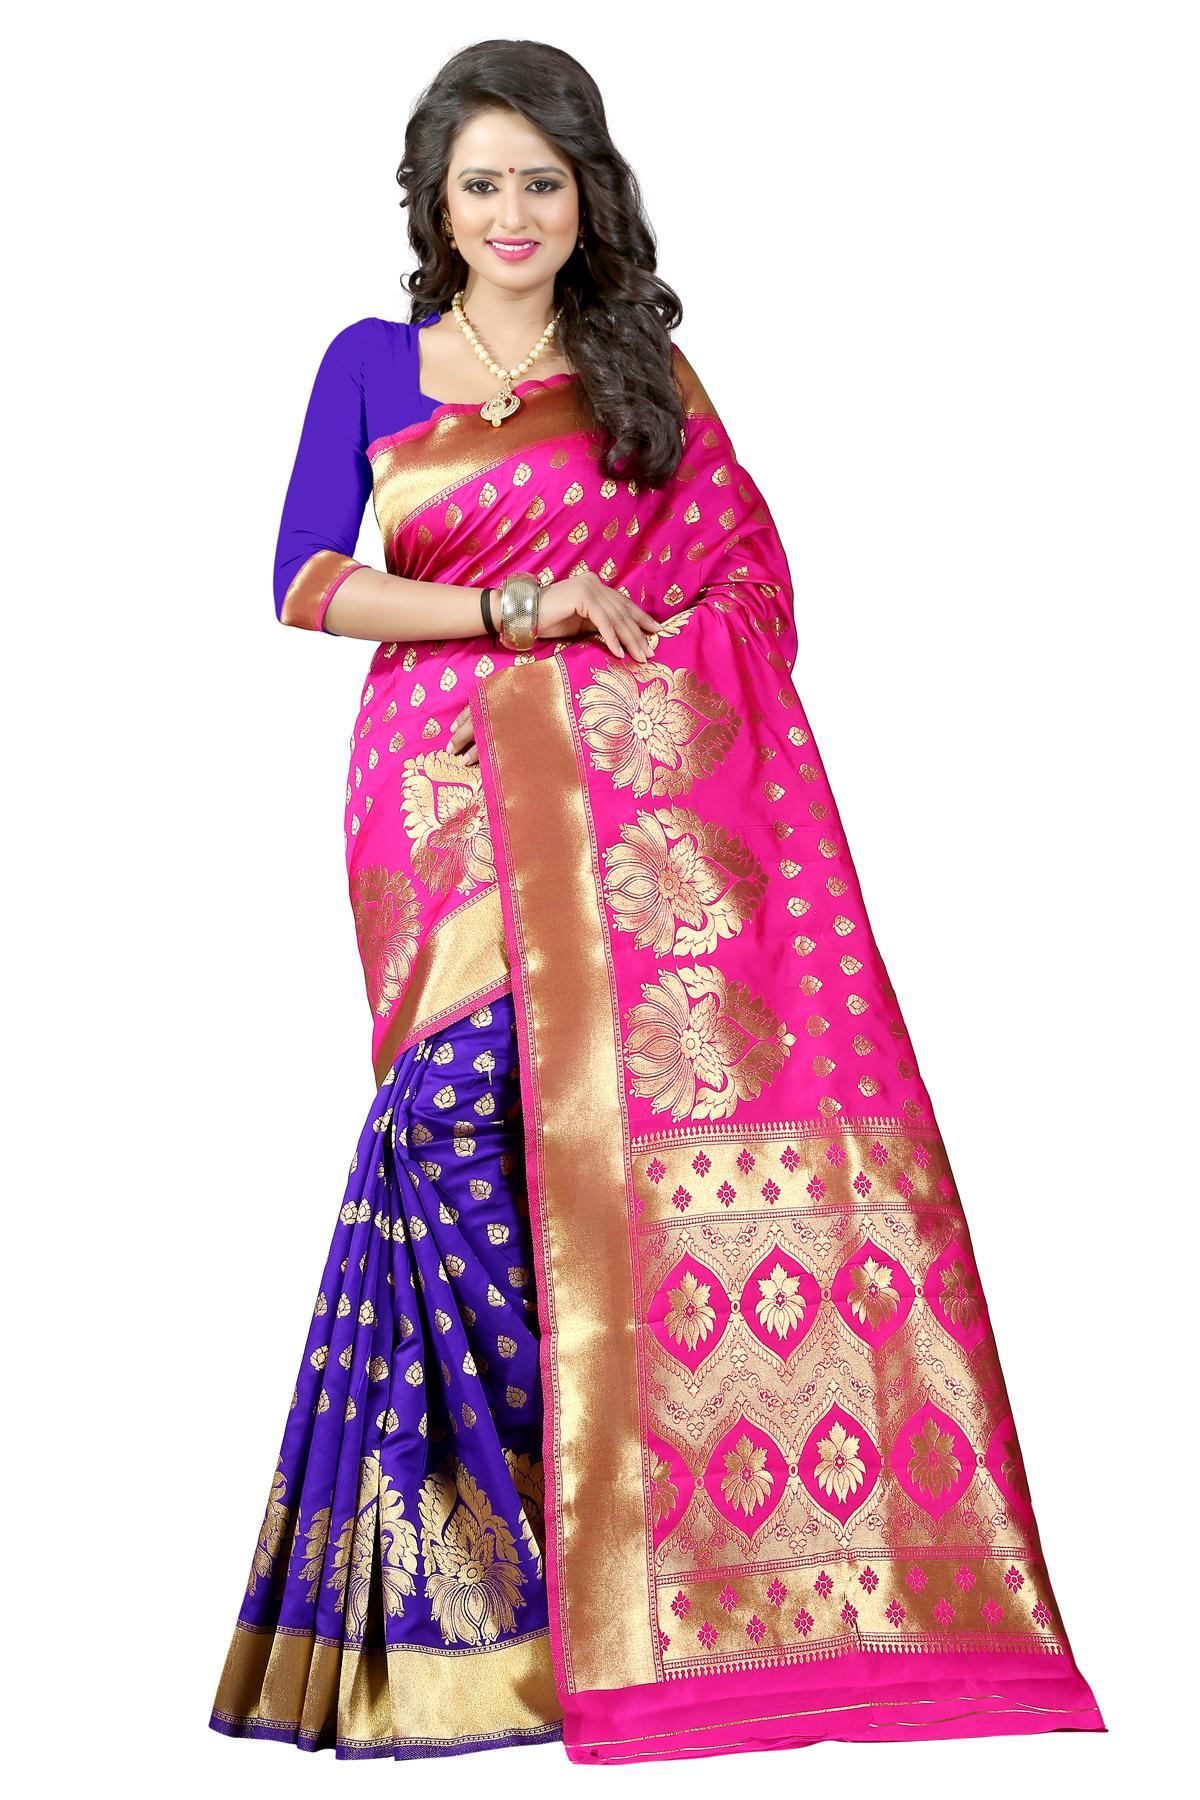 Pink Saree Online Buy Hot Sarees With Golden Border For Women Kemeja Lavender Contrast Multicolor Shop At Velvet